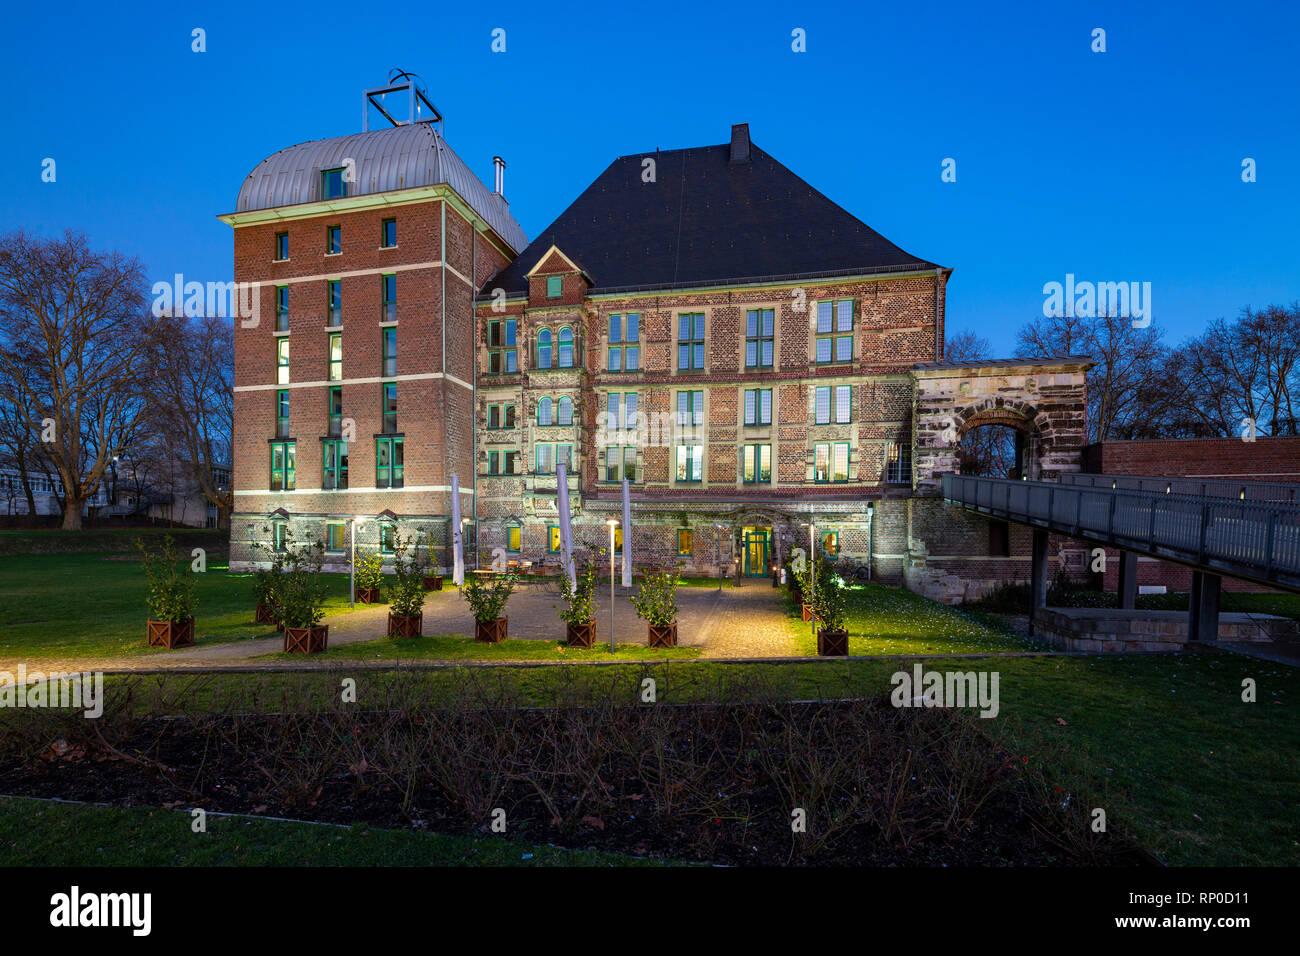 D-Gelsenkirchen, D-Gelsenkirchen-Horst, Ruhr area, Westphalia, North Rhine-Westphalia, NRW, Castle Horst, Lippe Renaissance, culture centre, museum, registry office, restaurant, castle gate, archway, Bossage, rustic quoins, evening, twilight, blue hour, illumination - Stock Image